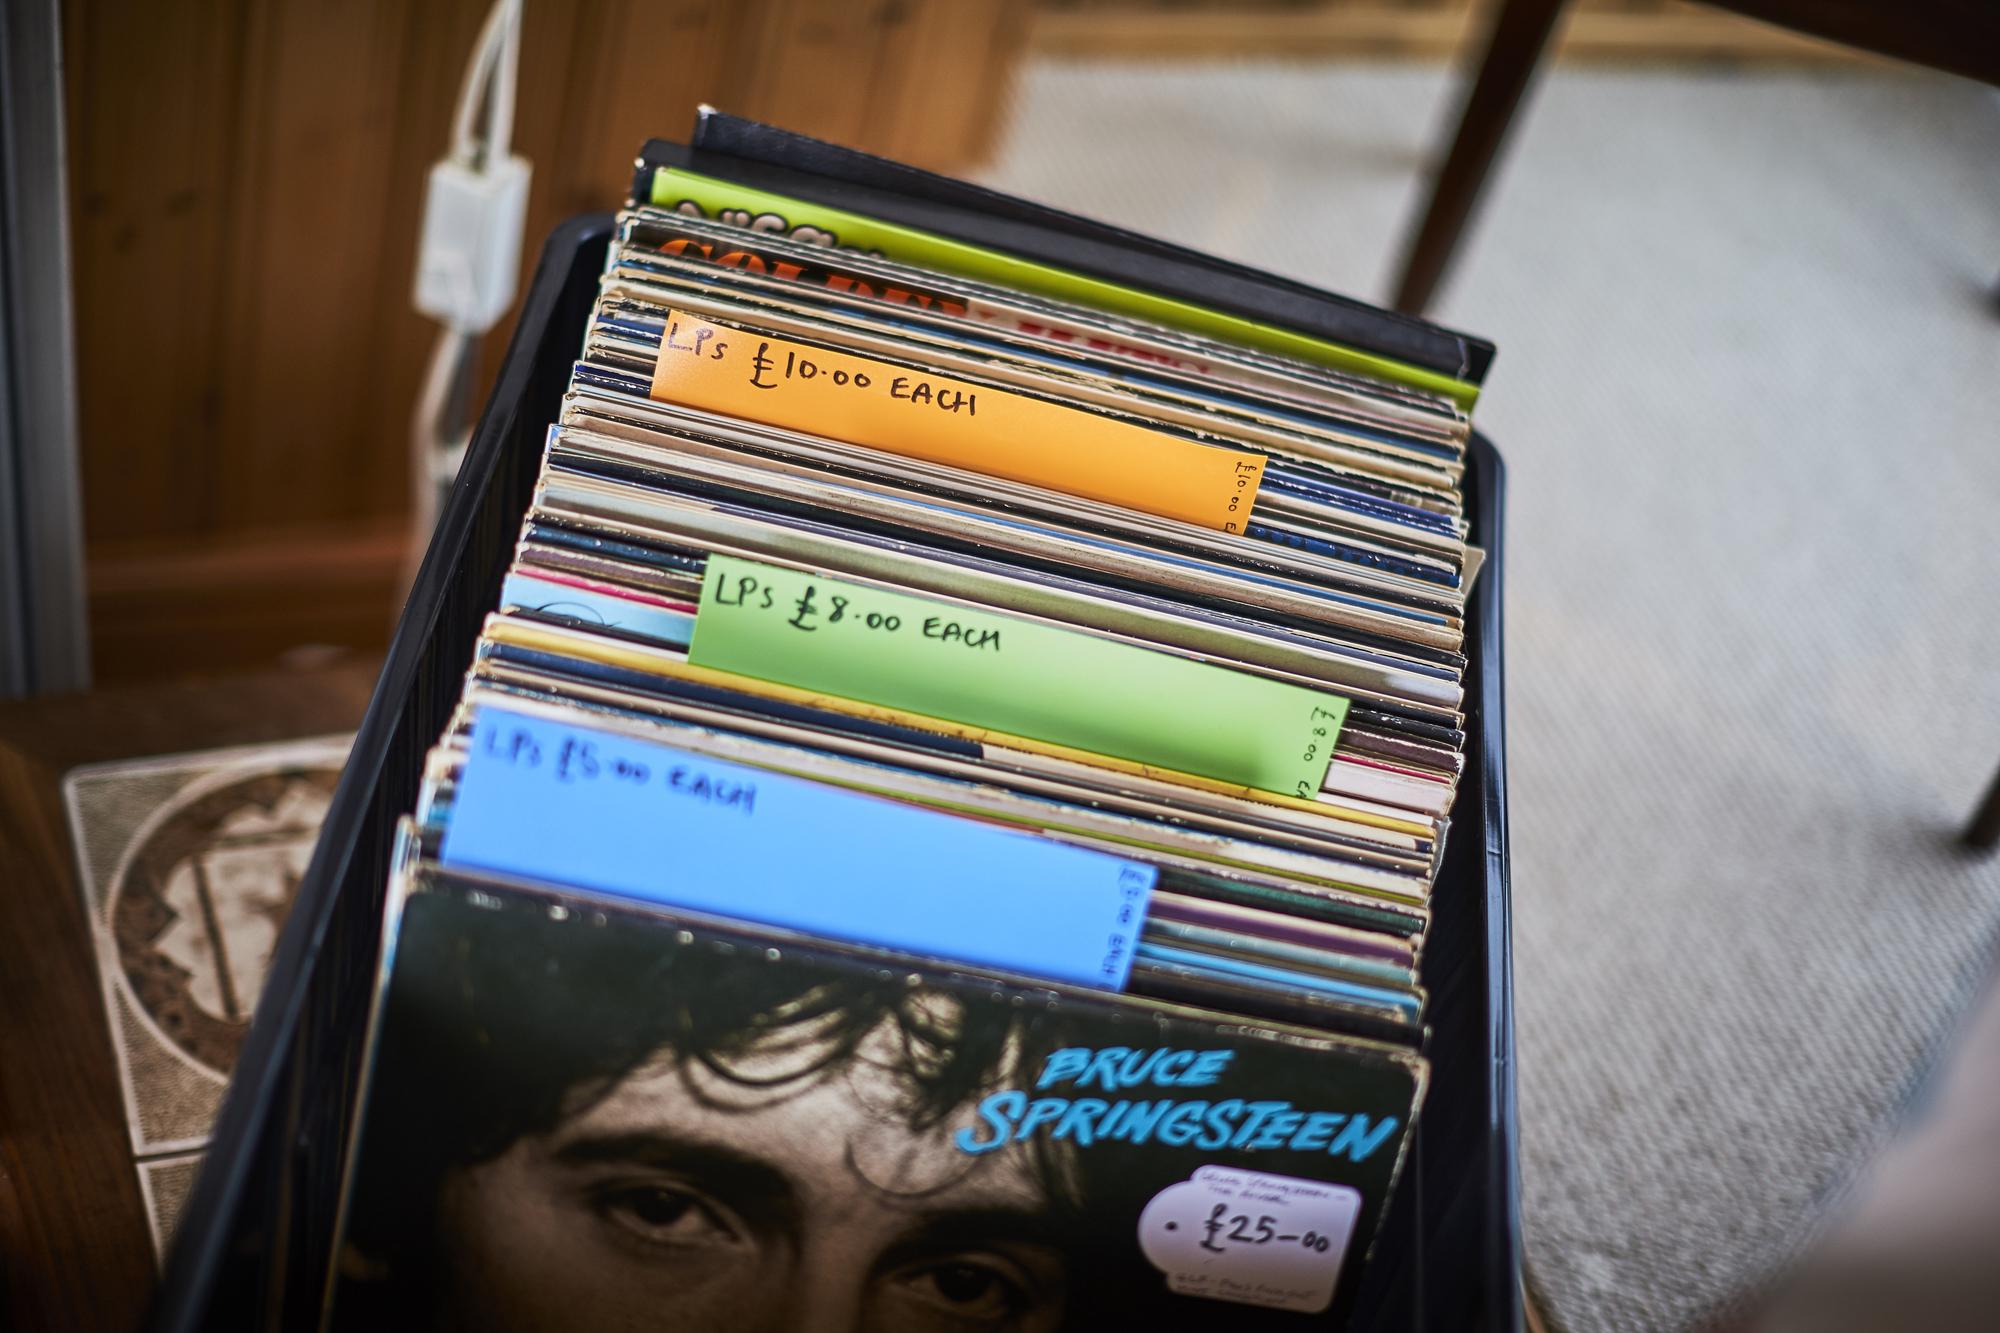 Stacks of groovy vinyls for sale